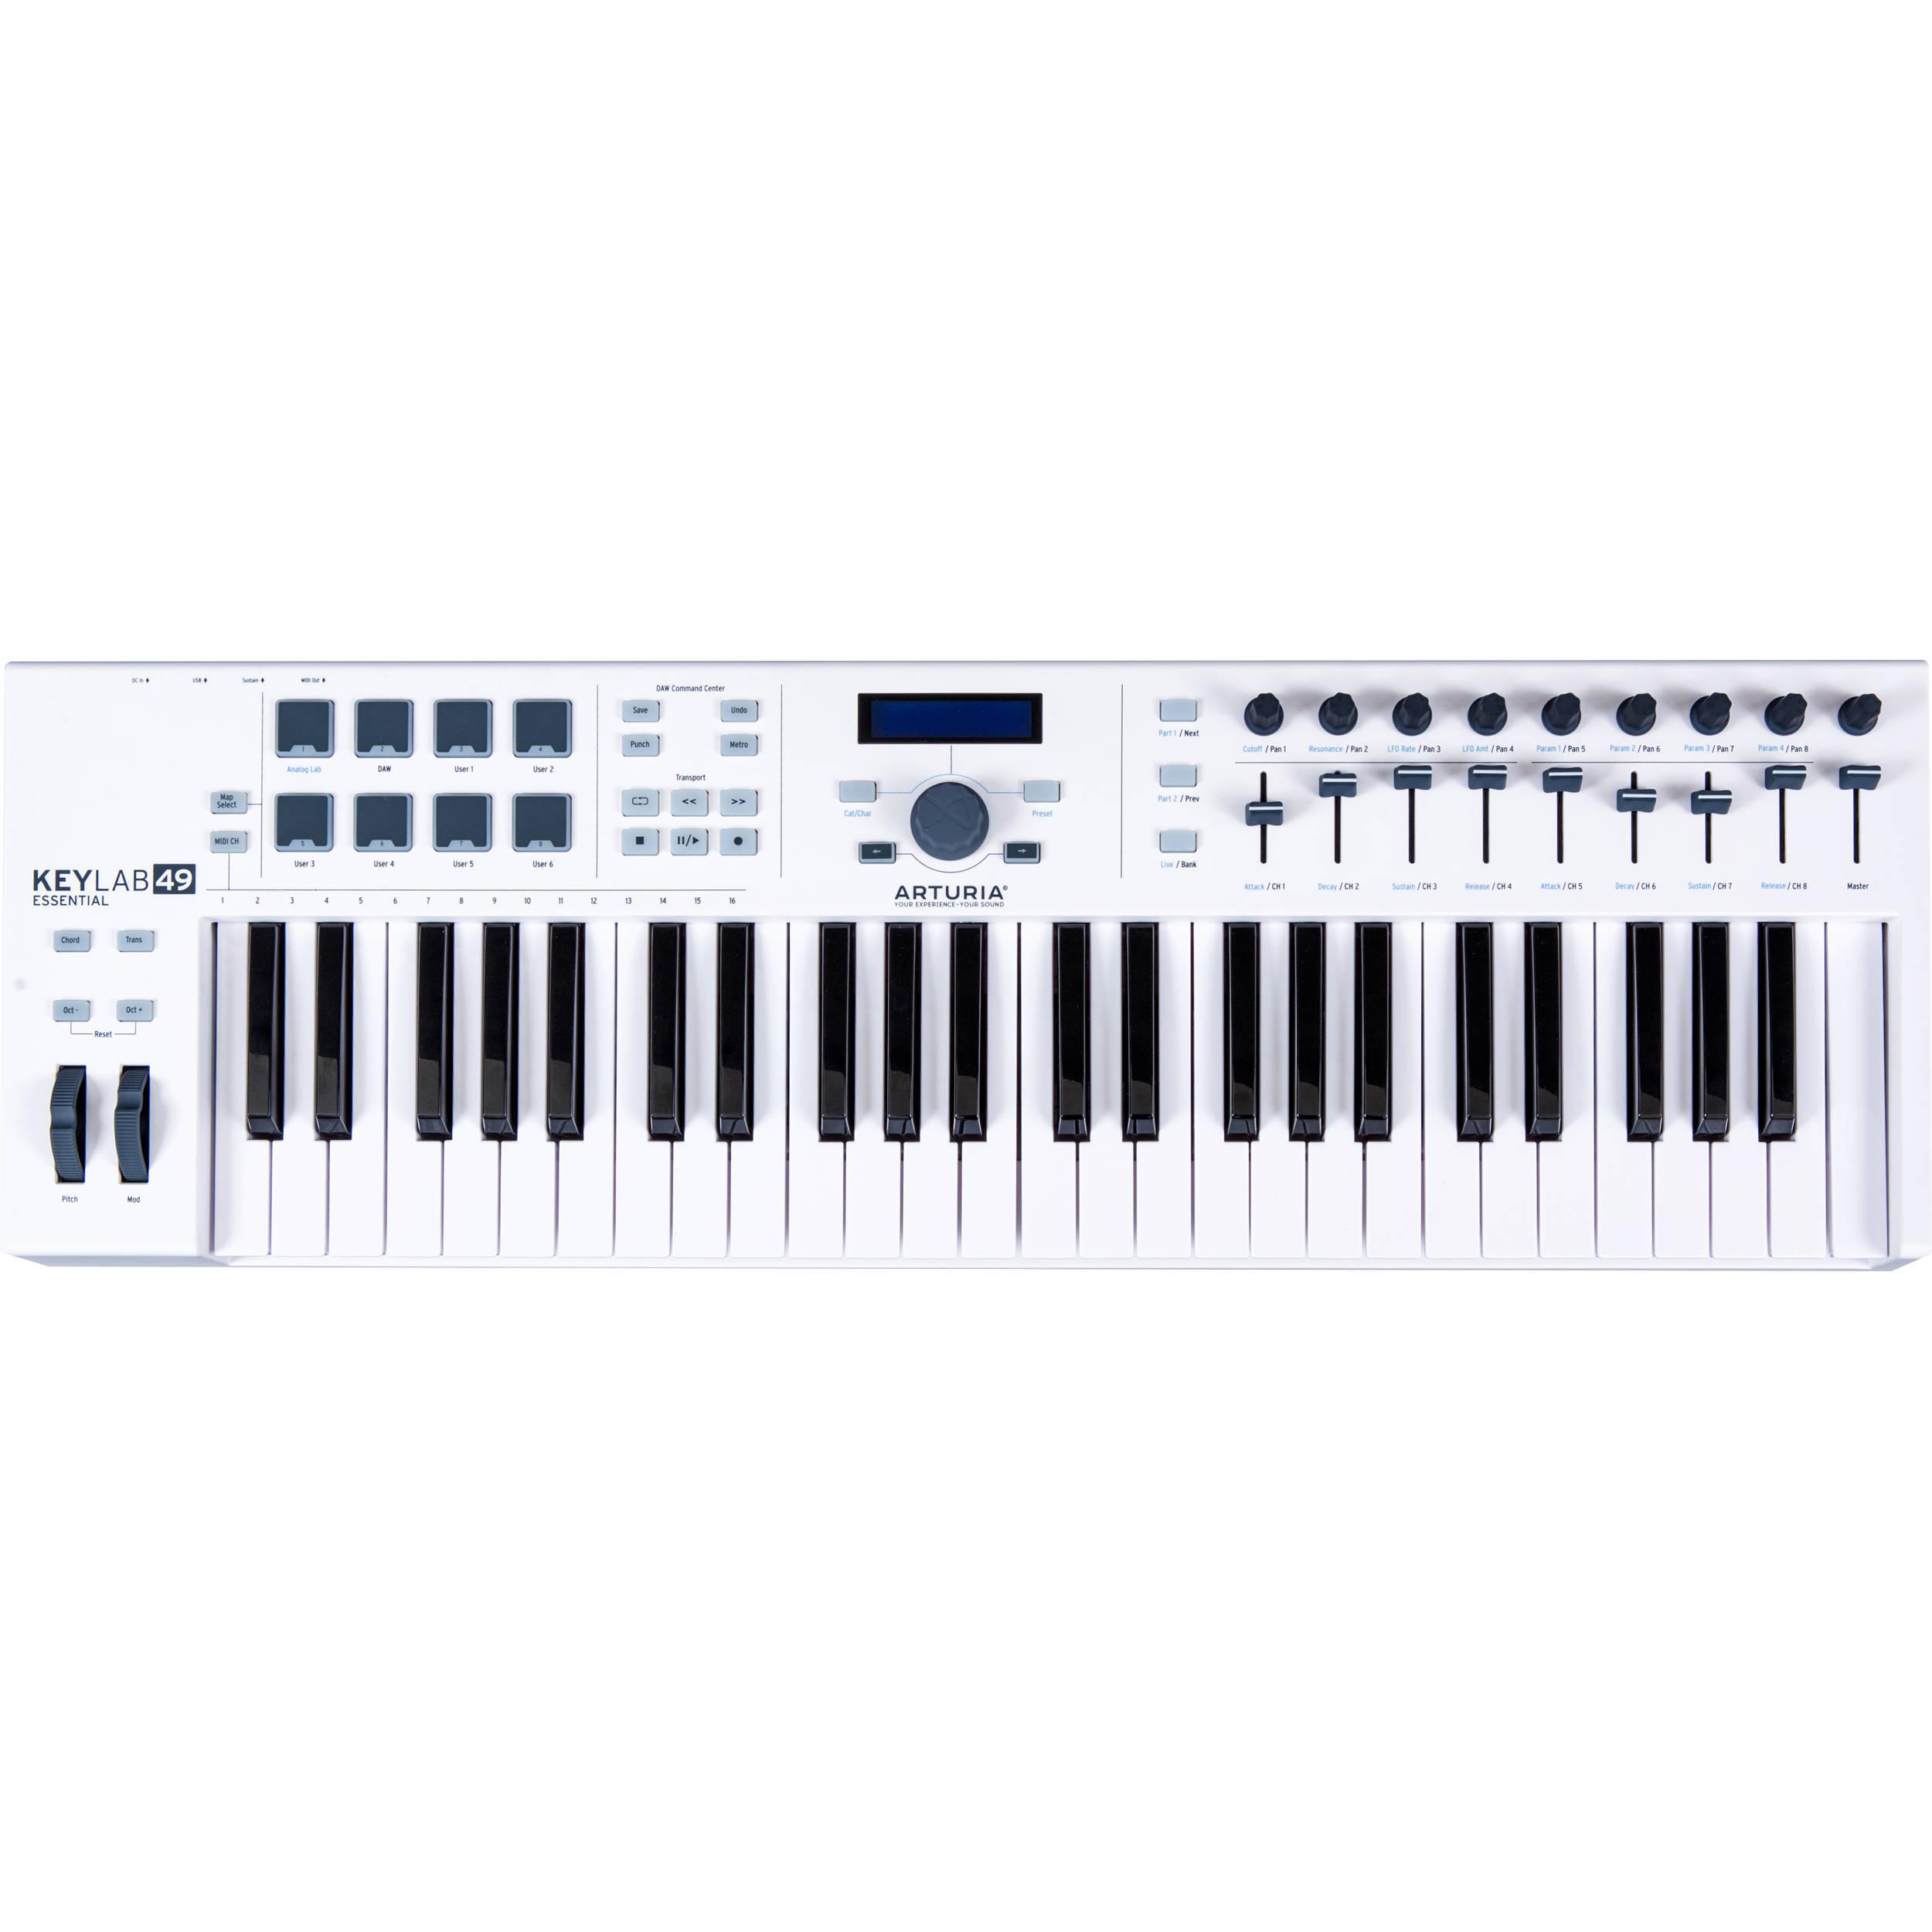 Arturia KeyLab Essential 49 - Universal MIDI Controller and Software (White)